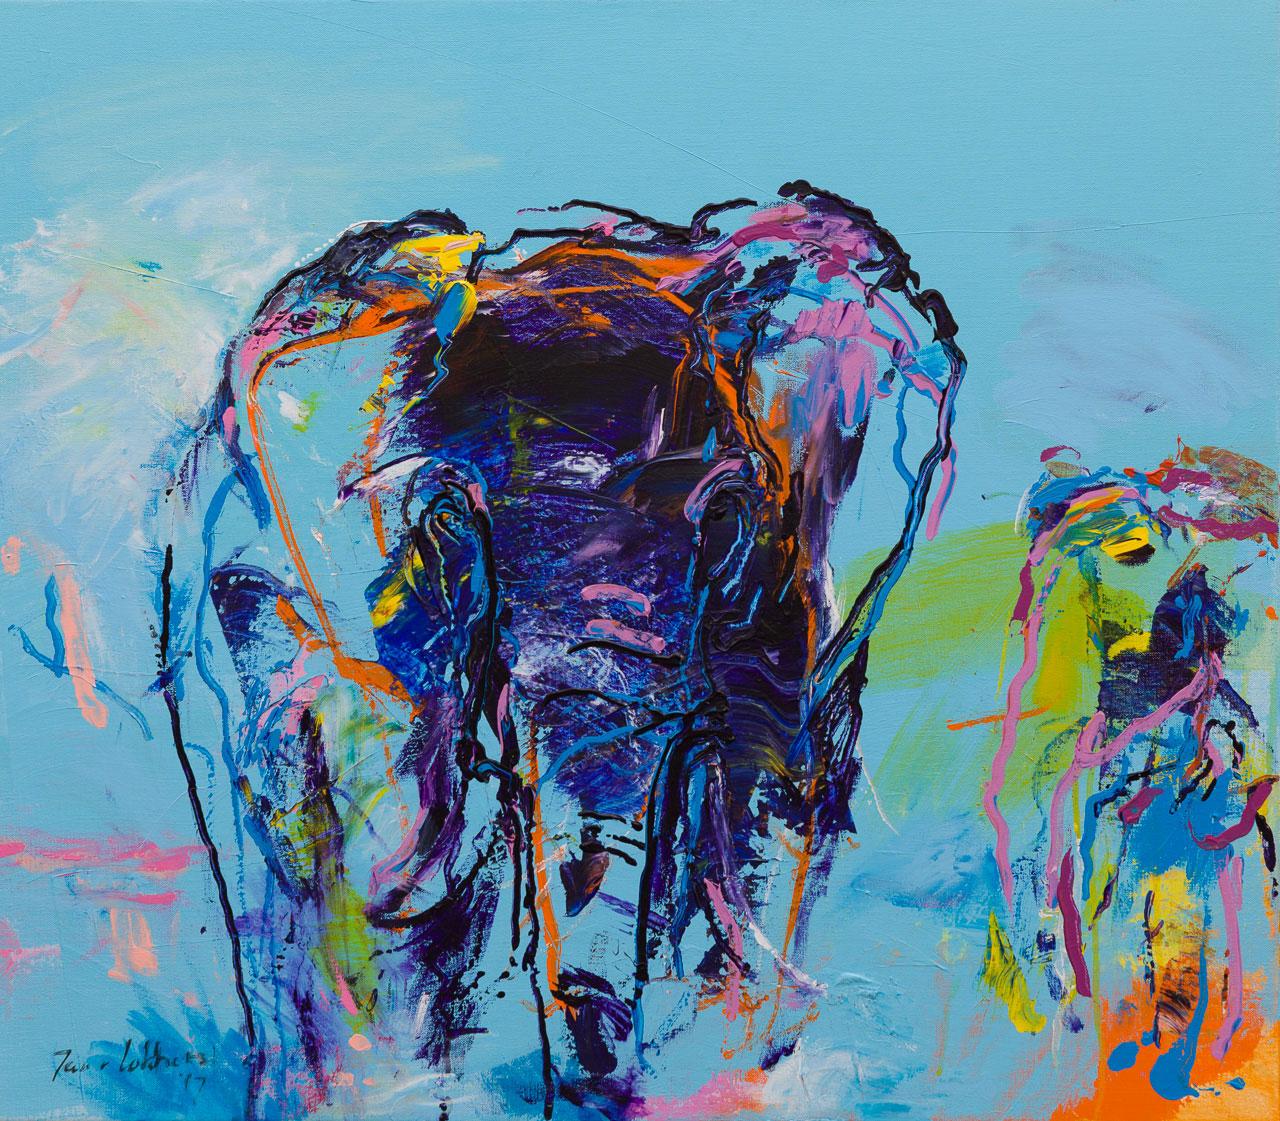 Olifanten schilderij blauw